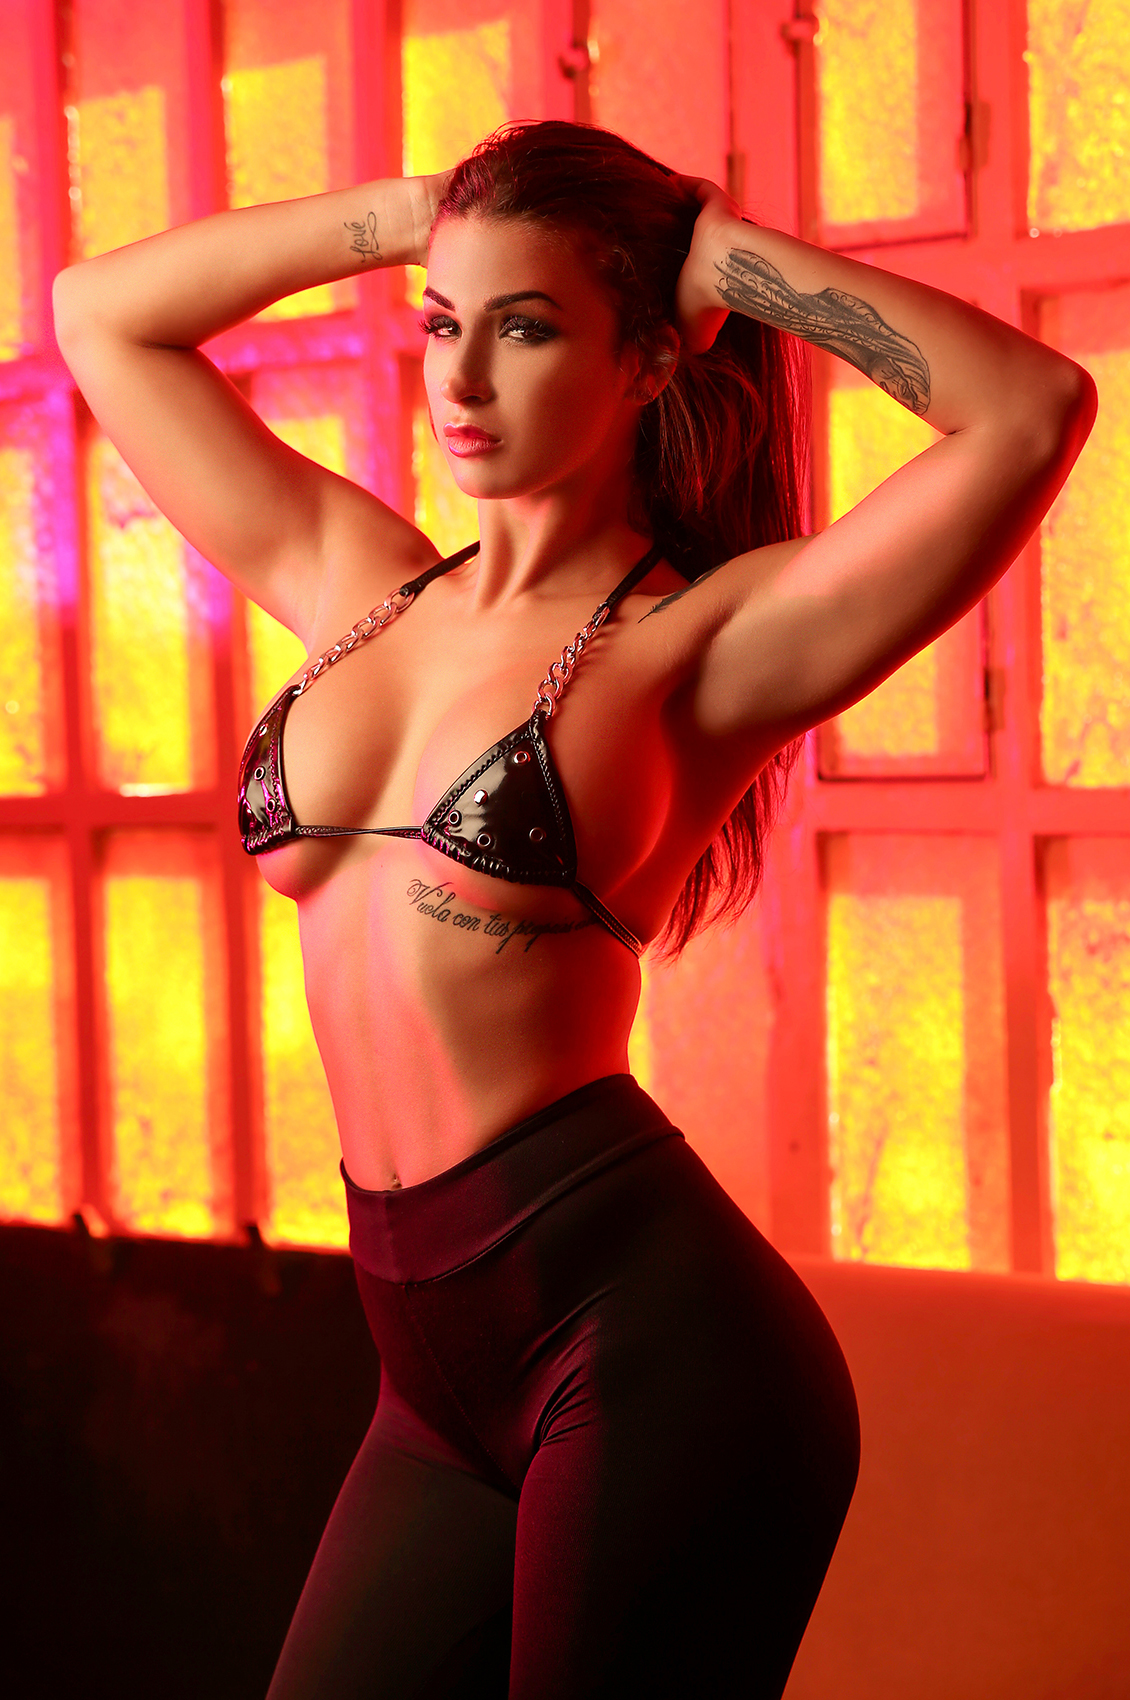 Susy Gala's VR Porn Videos, Bio & Free Nude Pics